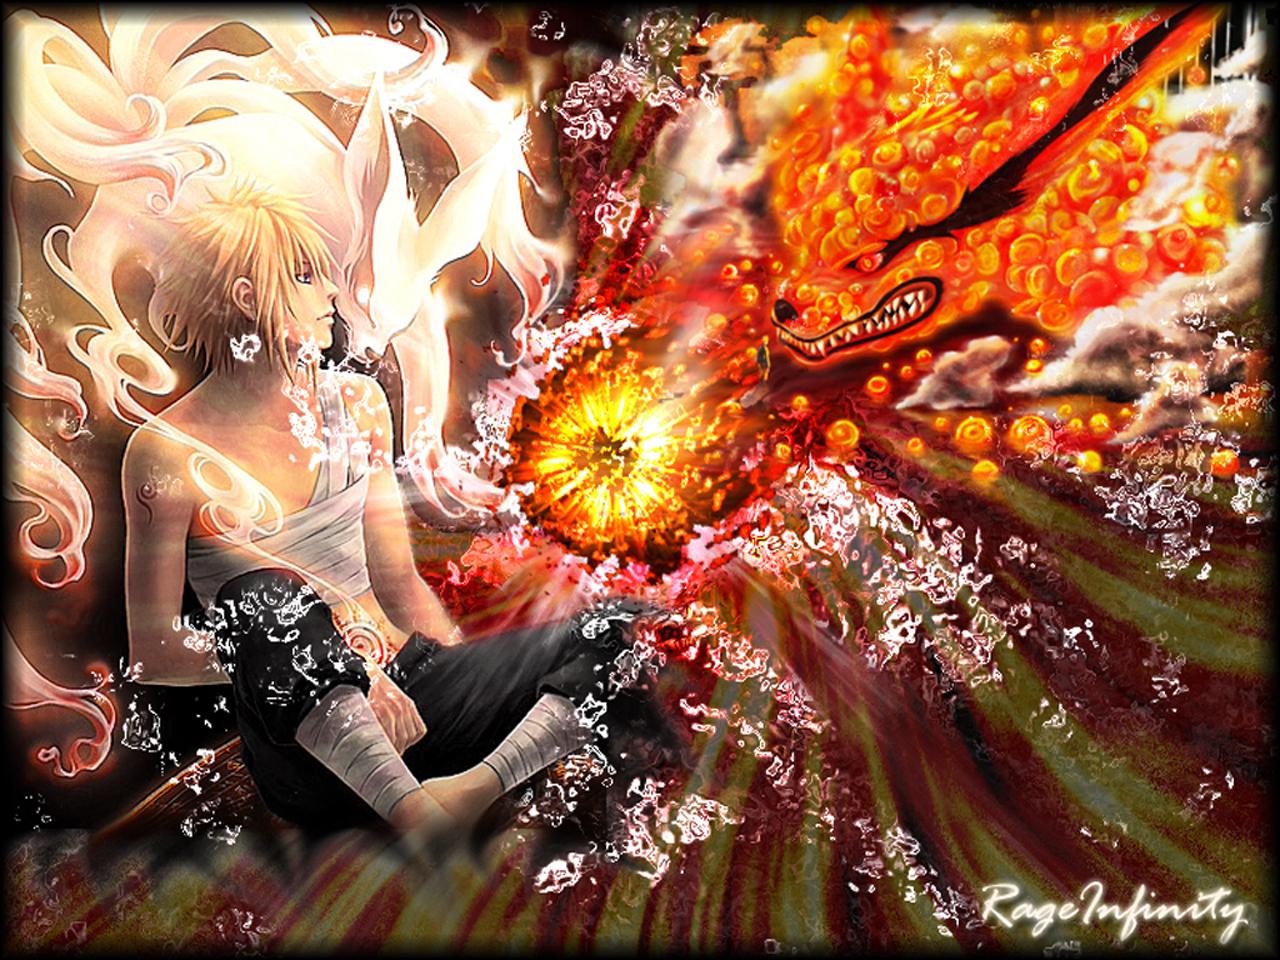 http://1.bp.blogspot.com/-8MZUNXL6zCs/T9Sj2SpAfeI/AAAAAAAAFSY/Gozmk5zr6Ig/s1600/Naruto-wallpaper-15.jpeg